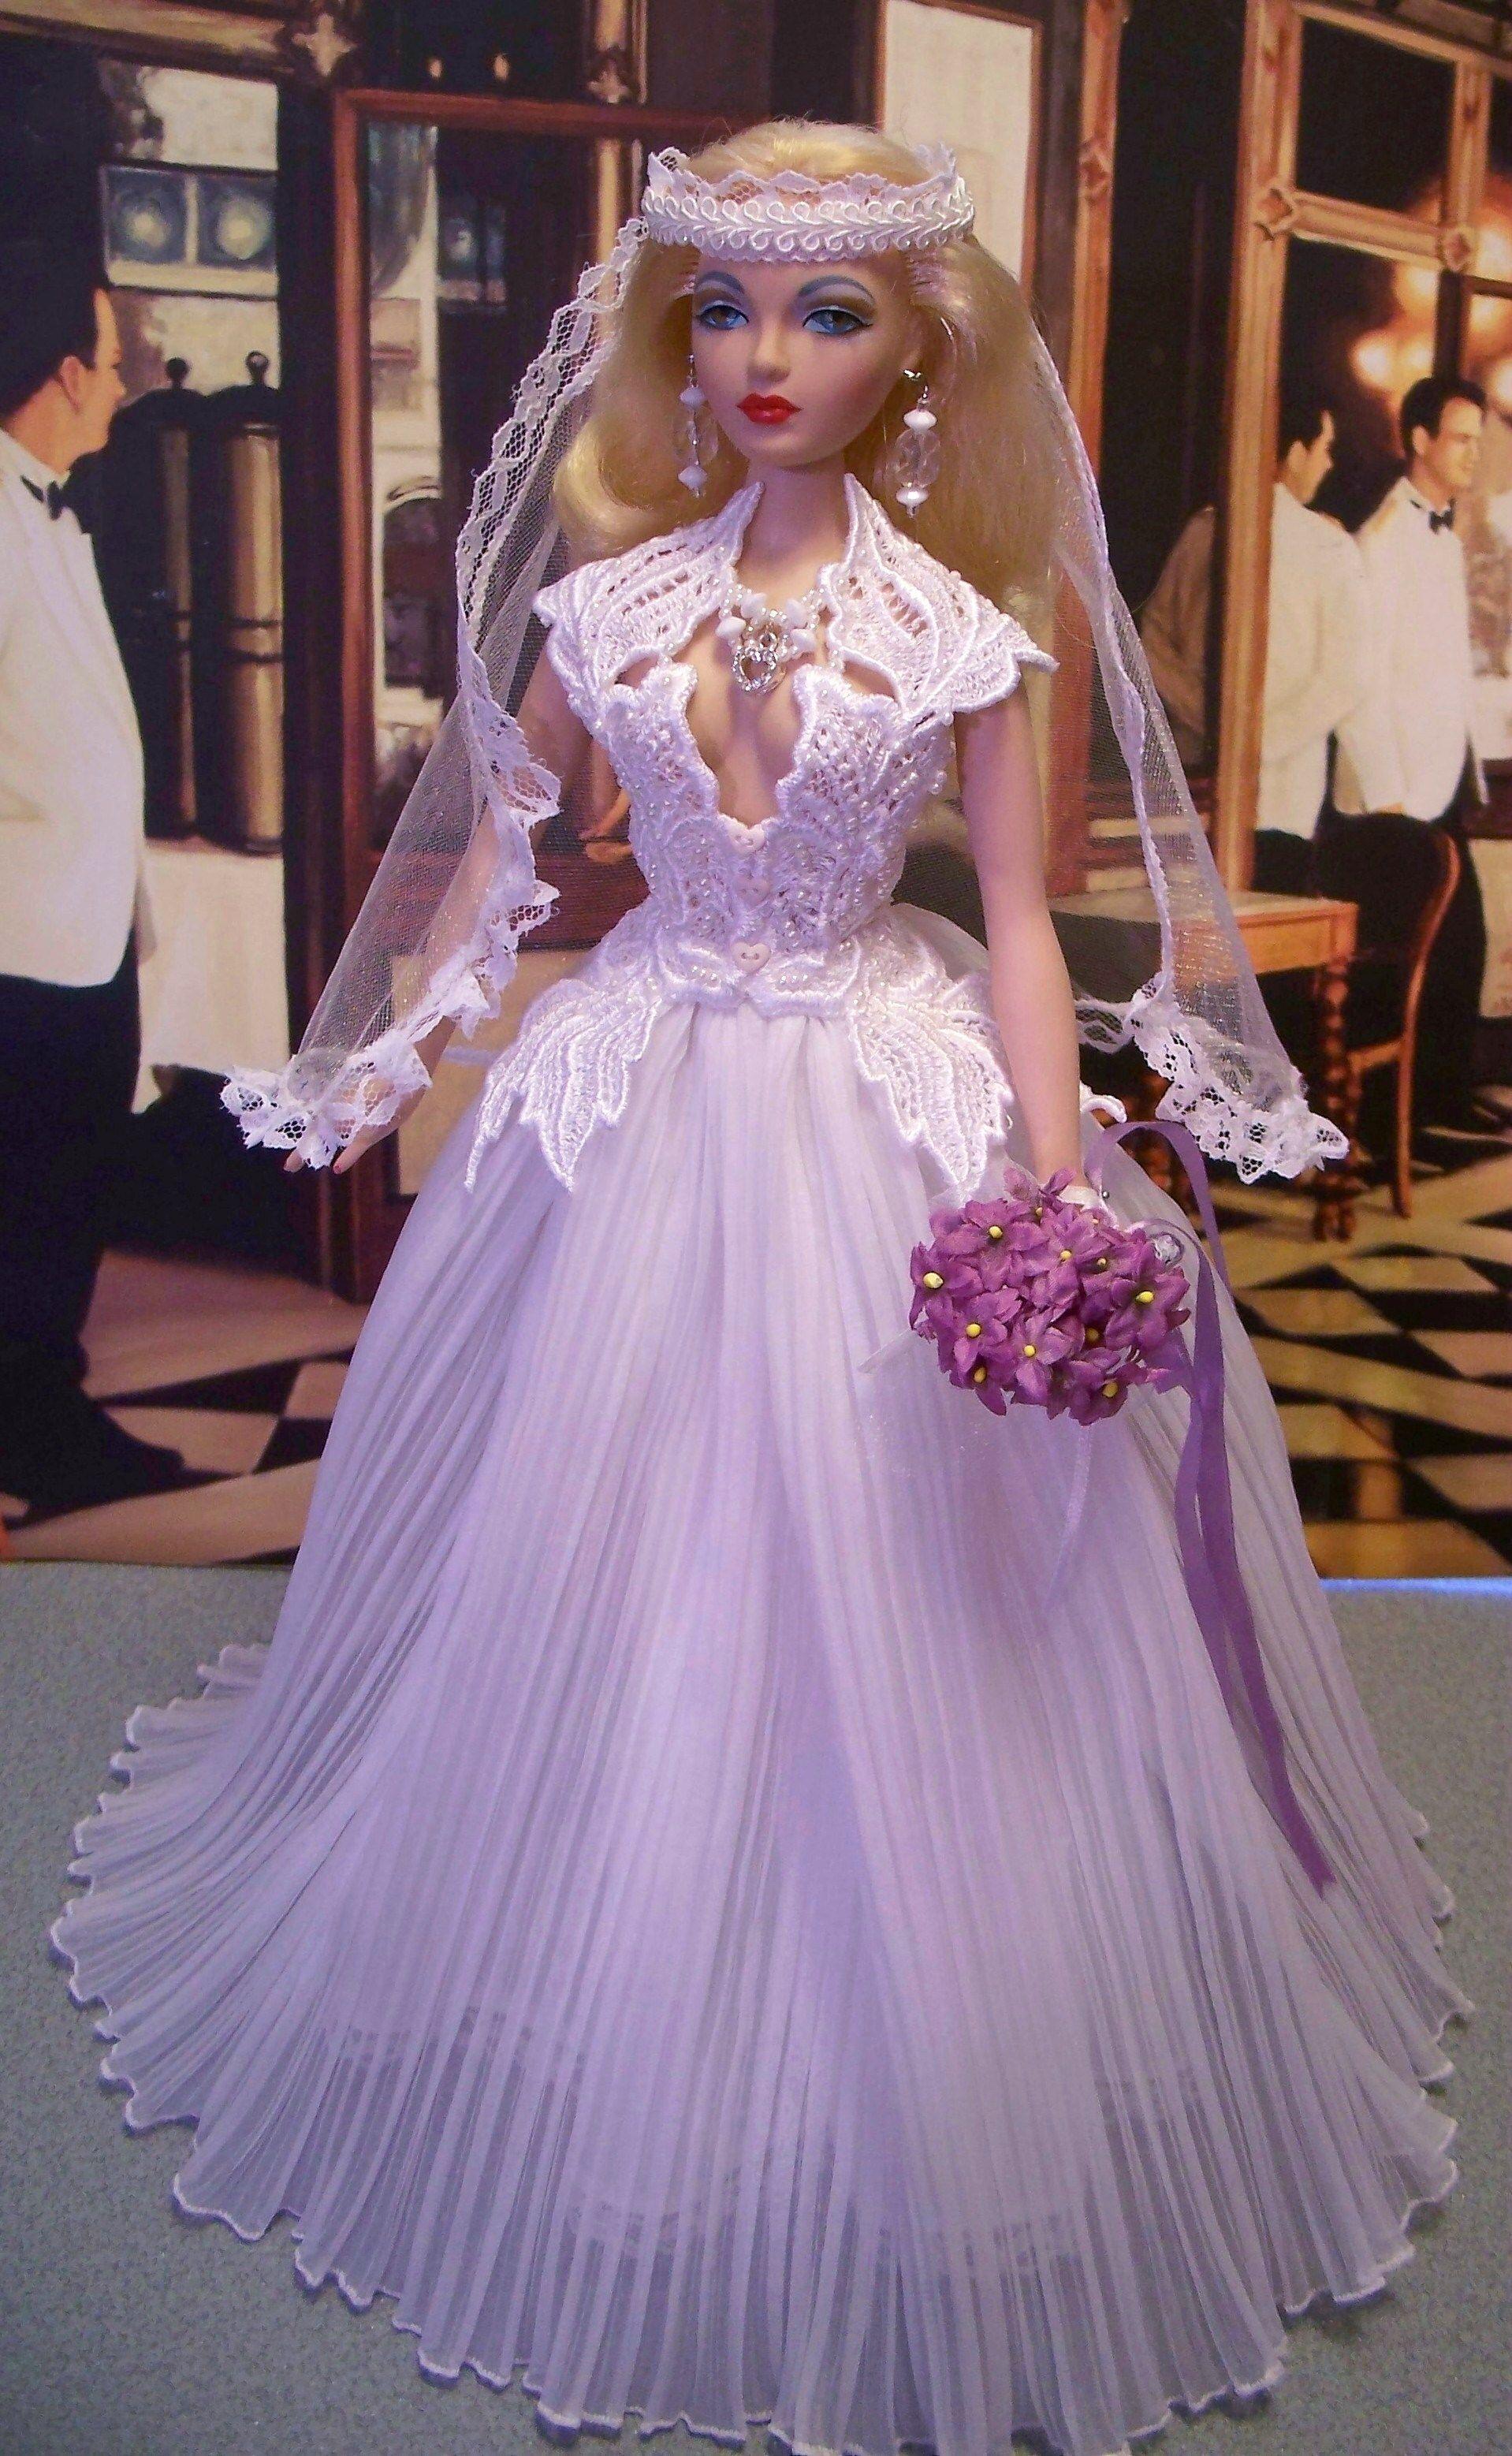 OOAK Doll Bride Fashion by Karen glammourdoll | novias | Pinterest ...